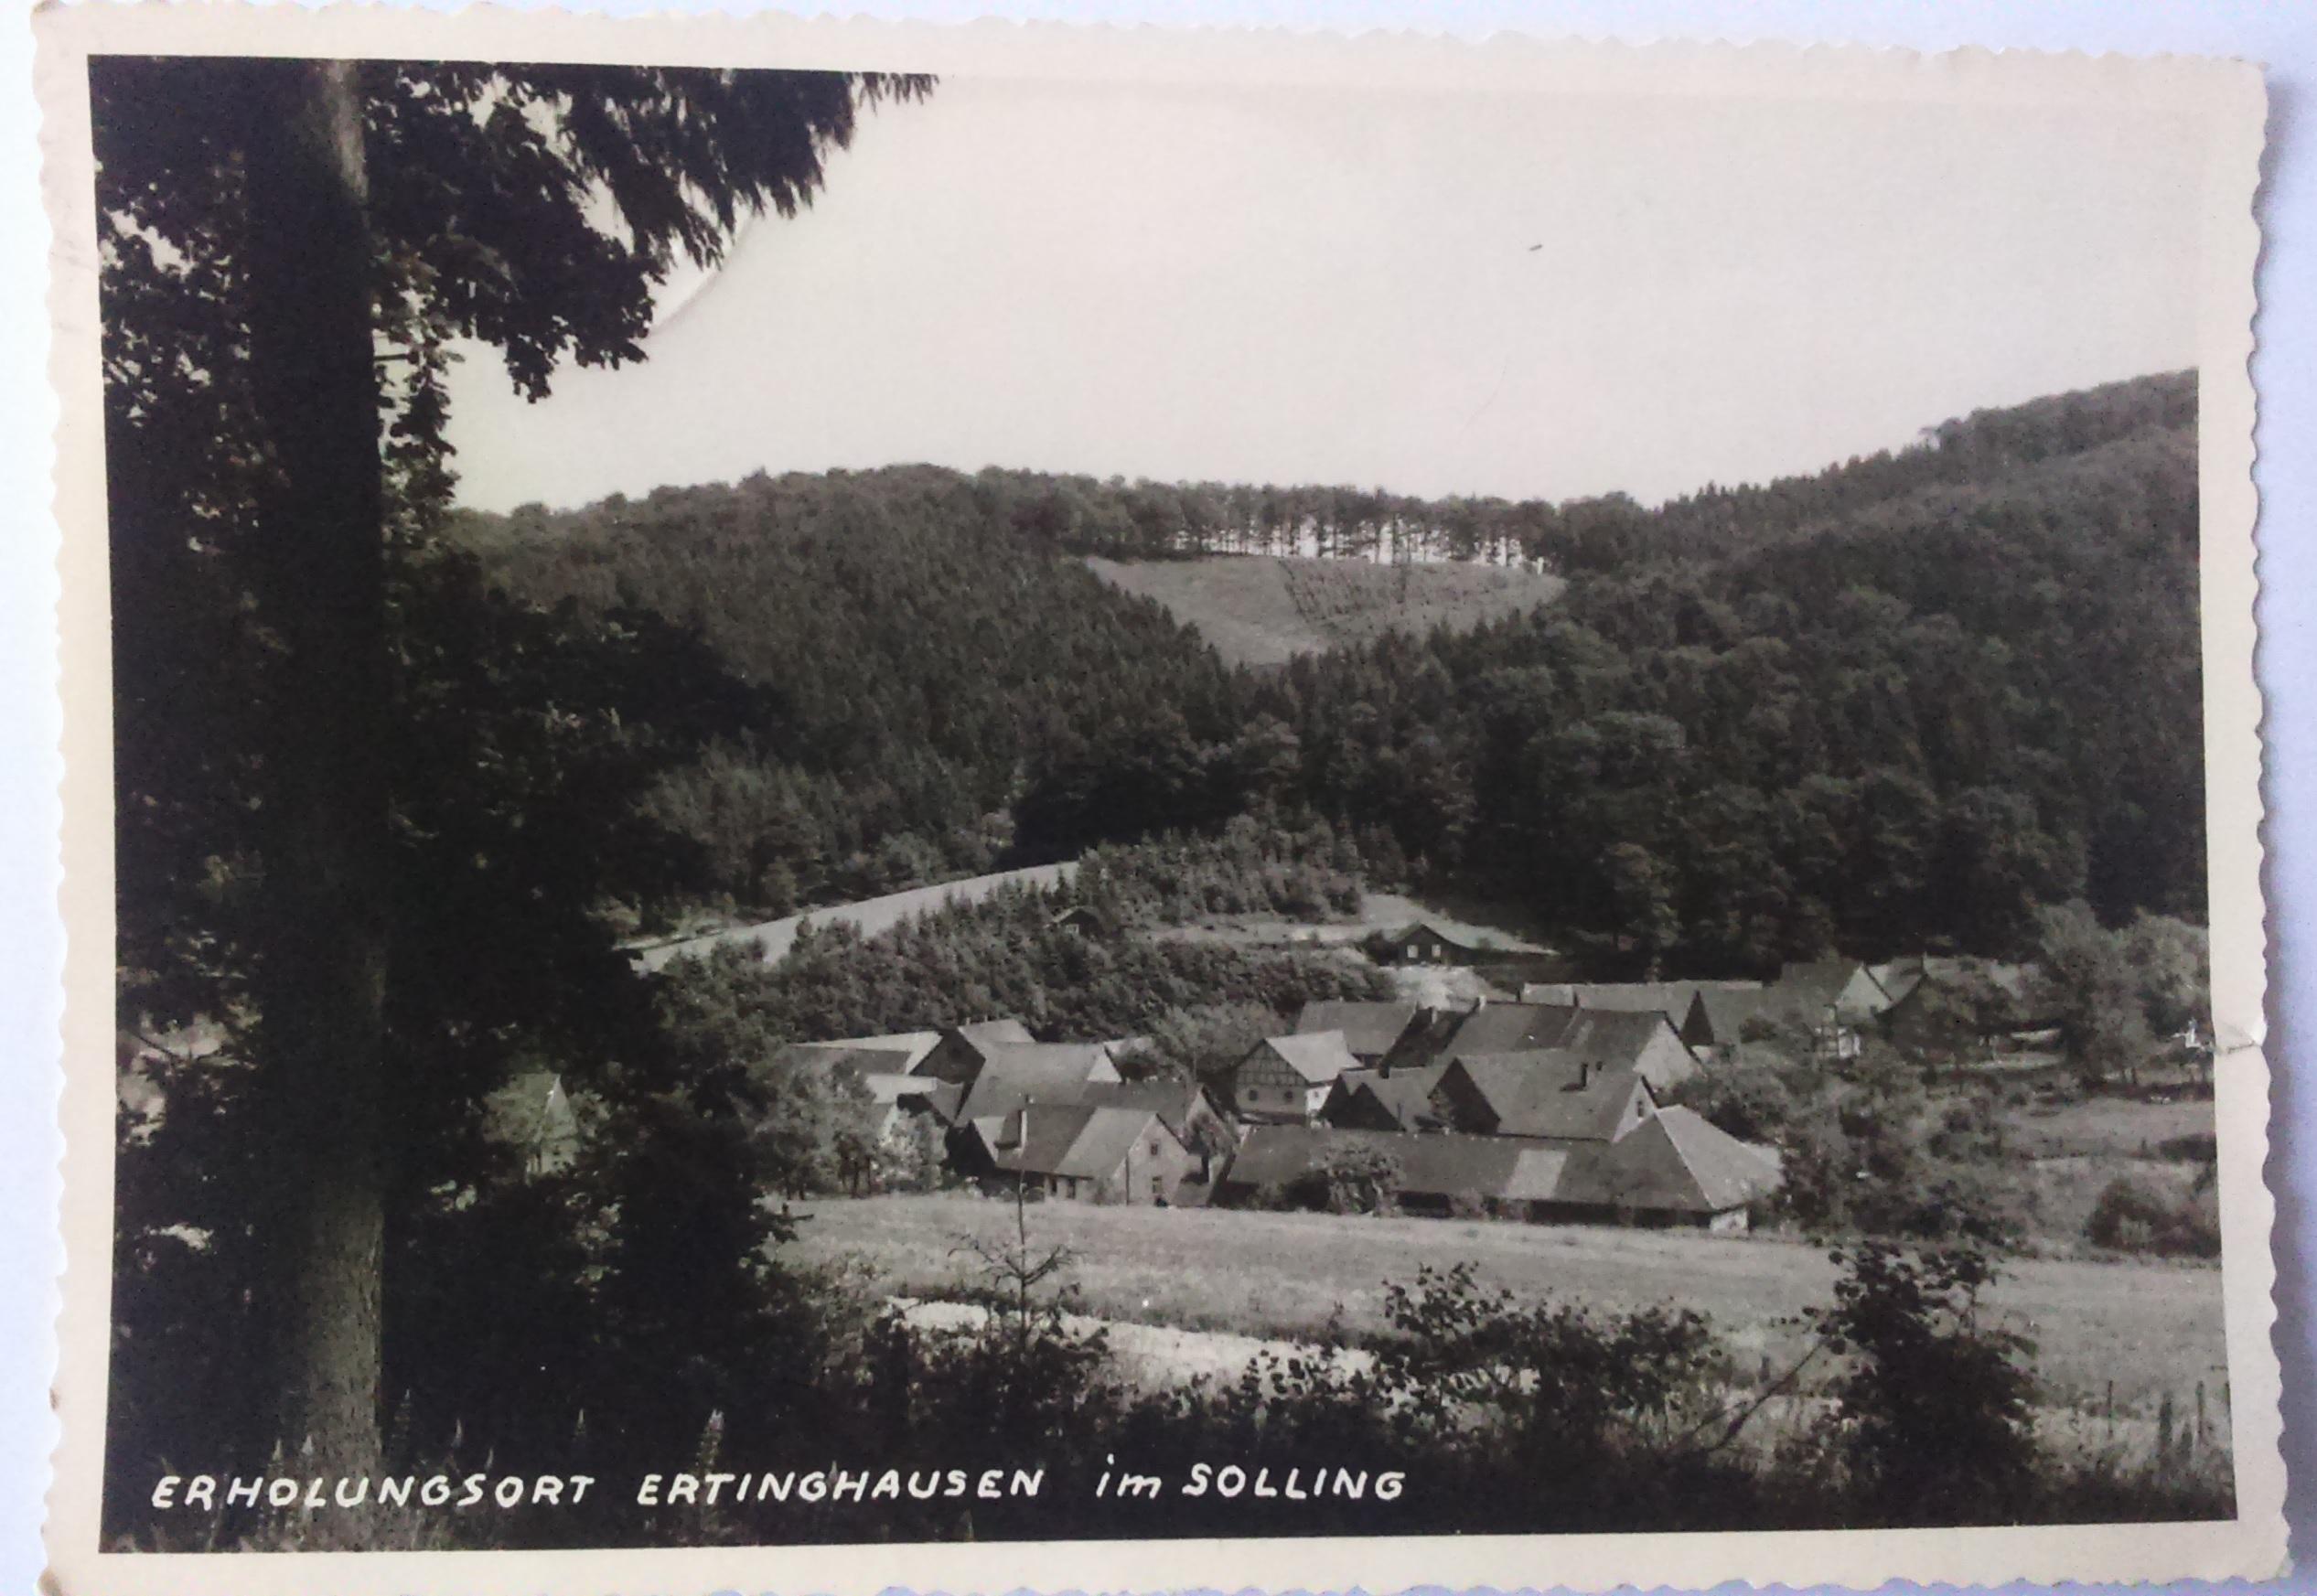 Erholungsort Ertinghausen im Solling (28.06.1960) front